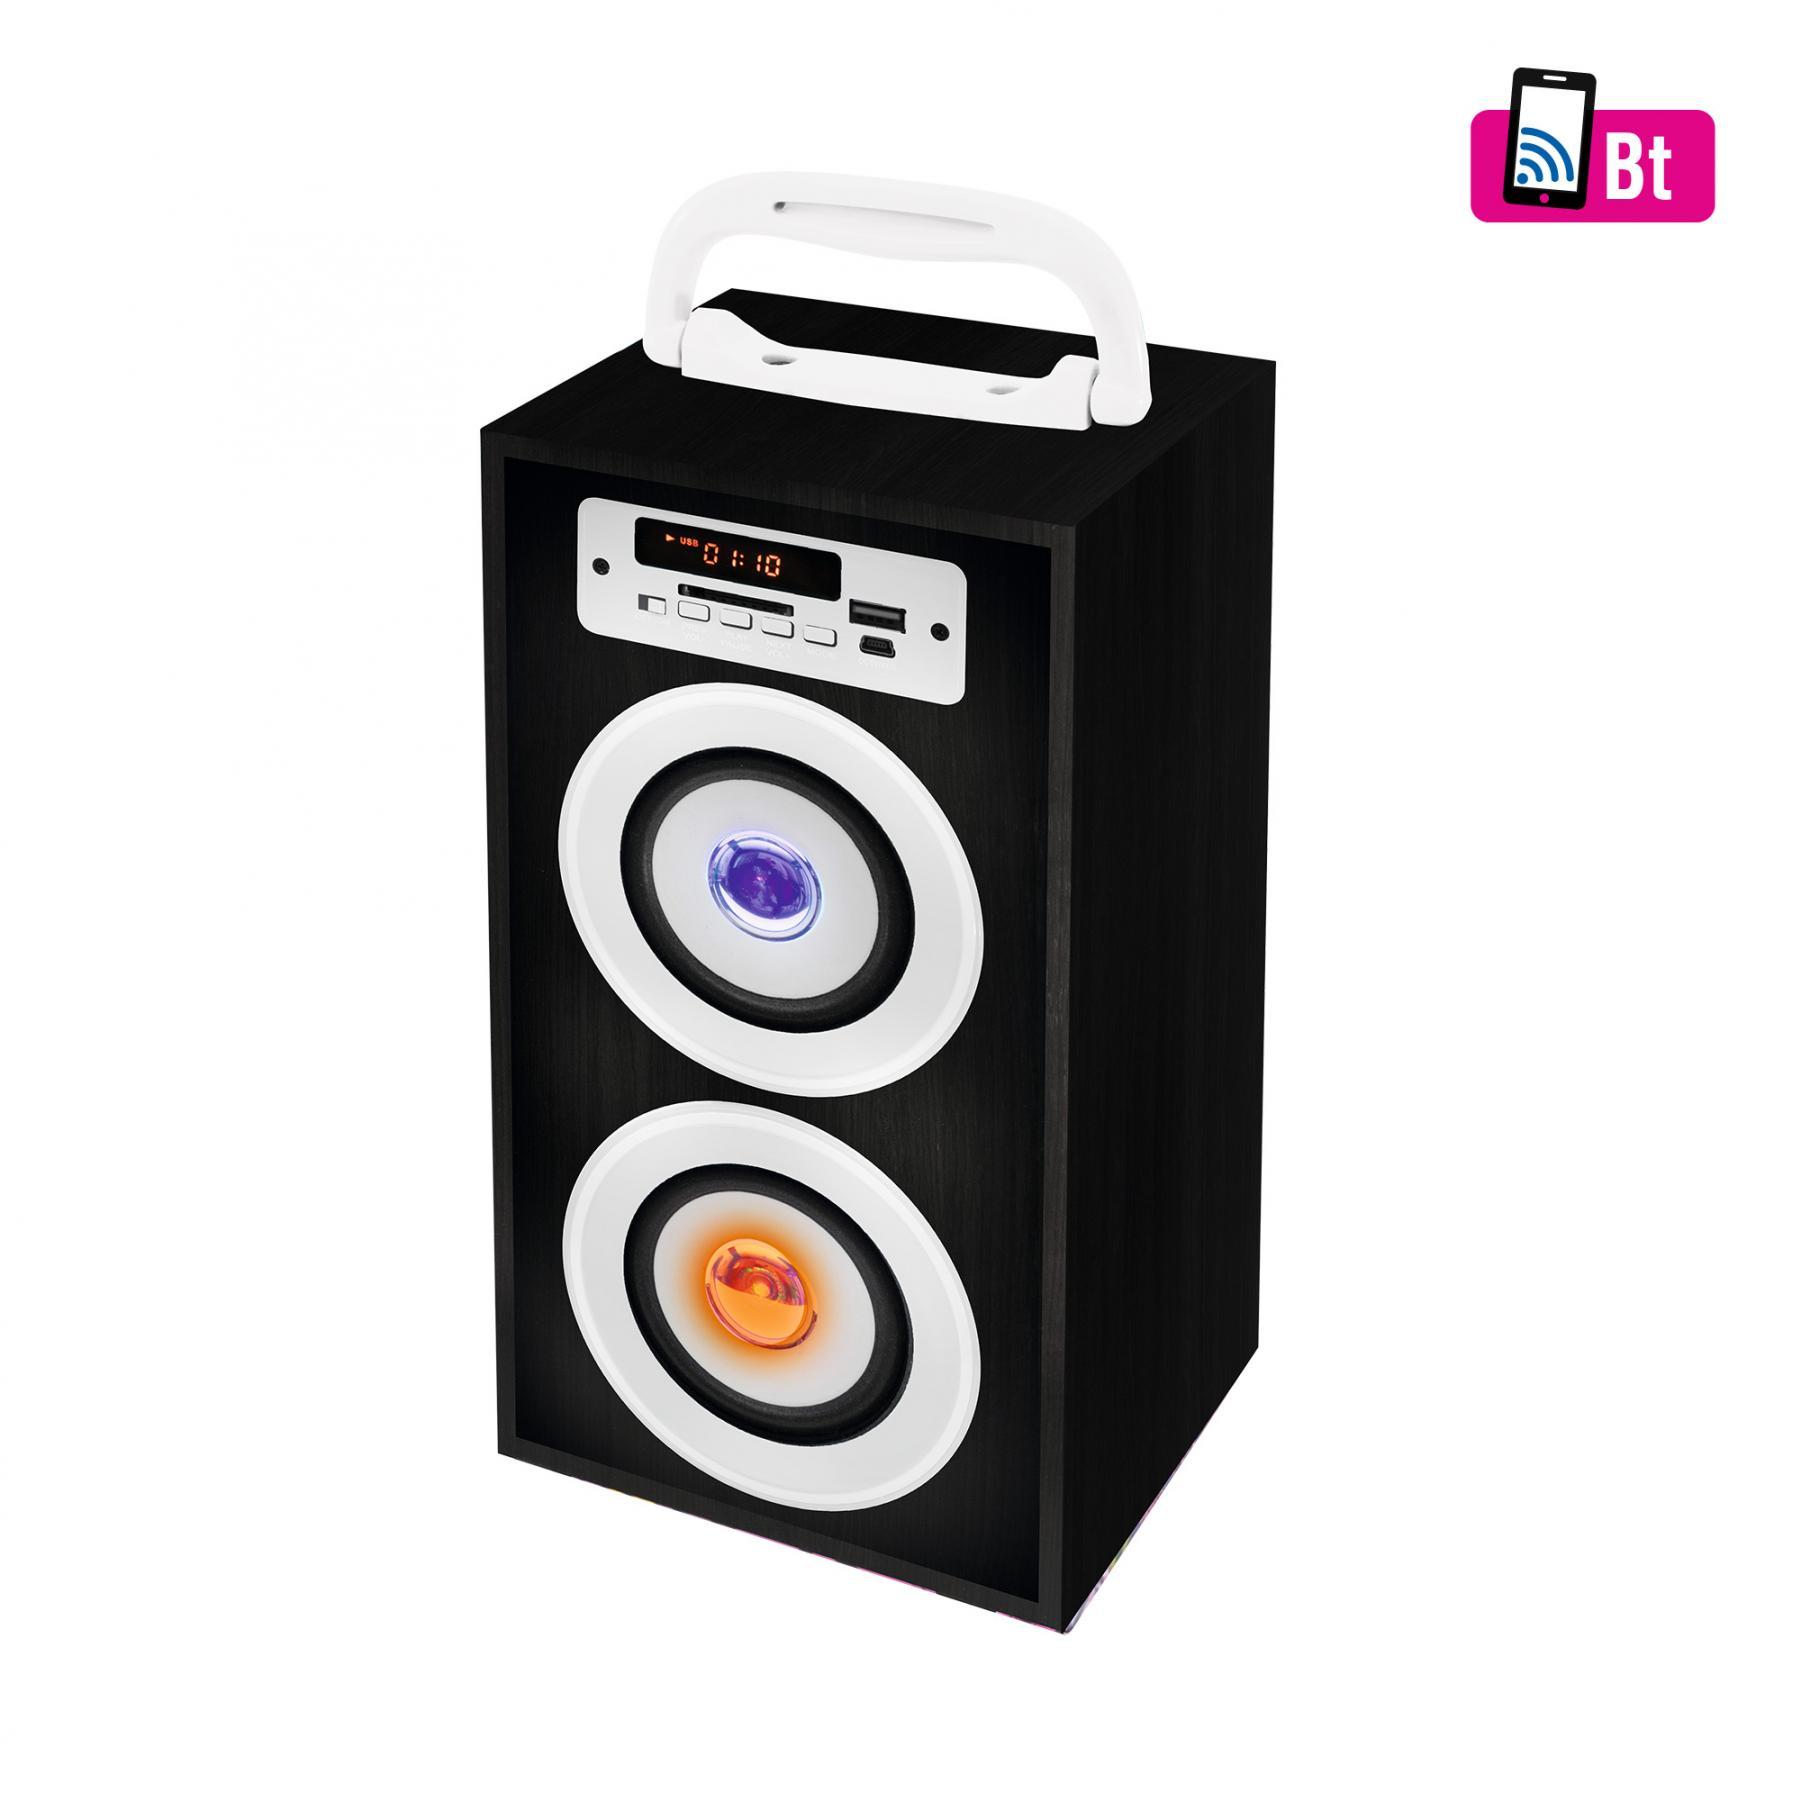 b5f5bc5c332e SAL BT 2800/BK Hordozható Bluetooth / USB multimédia hangszóró, 4 in 1,  fekete